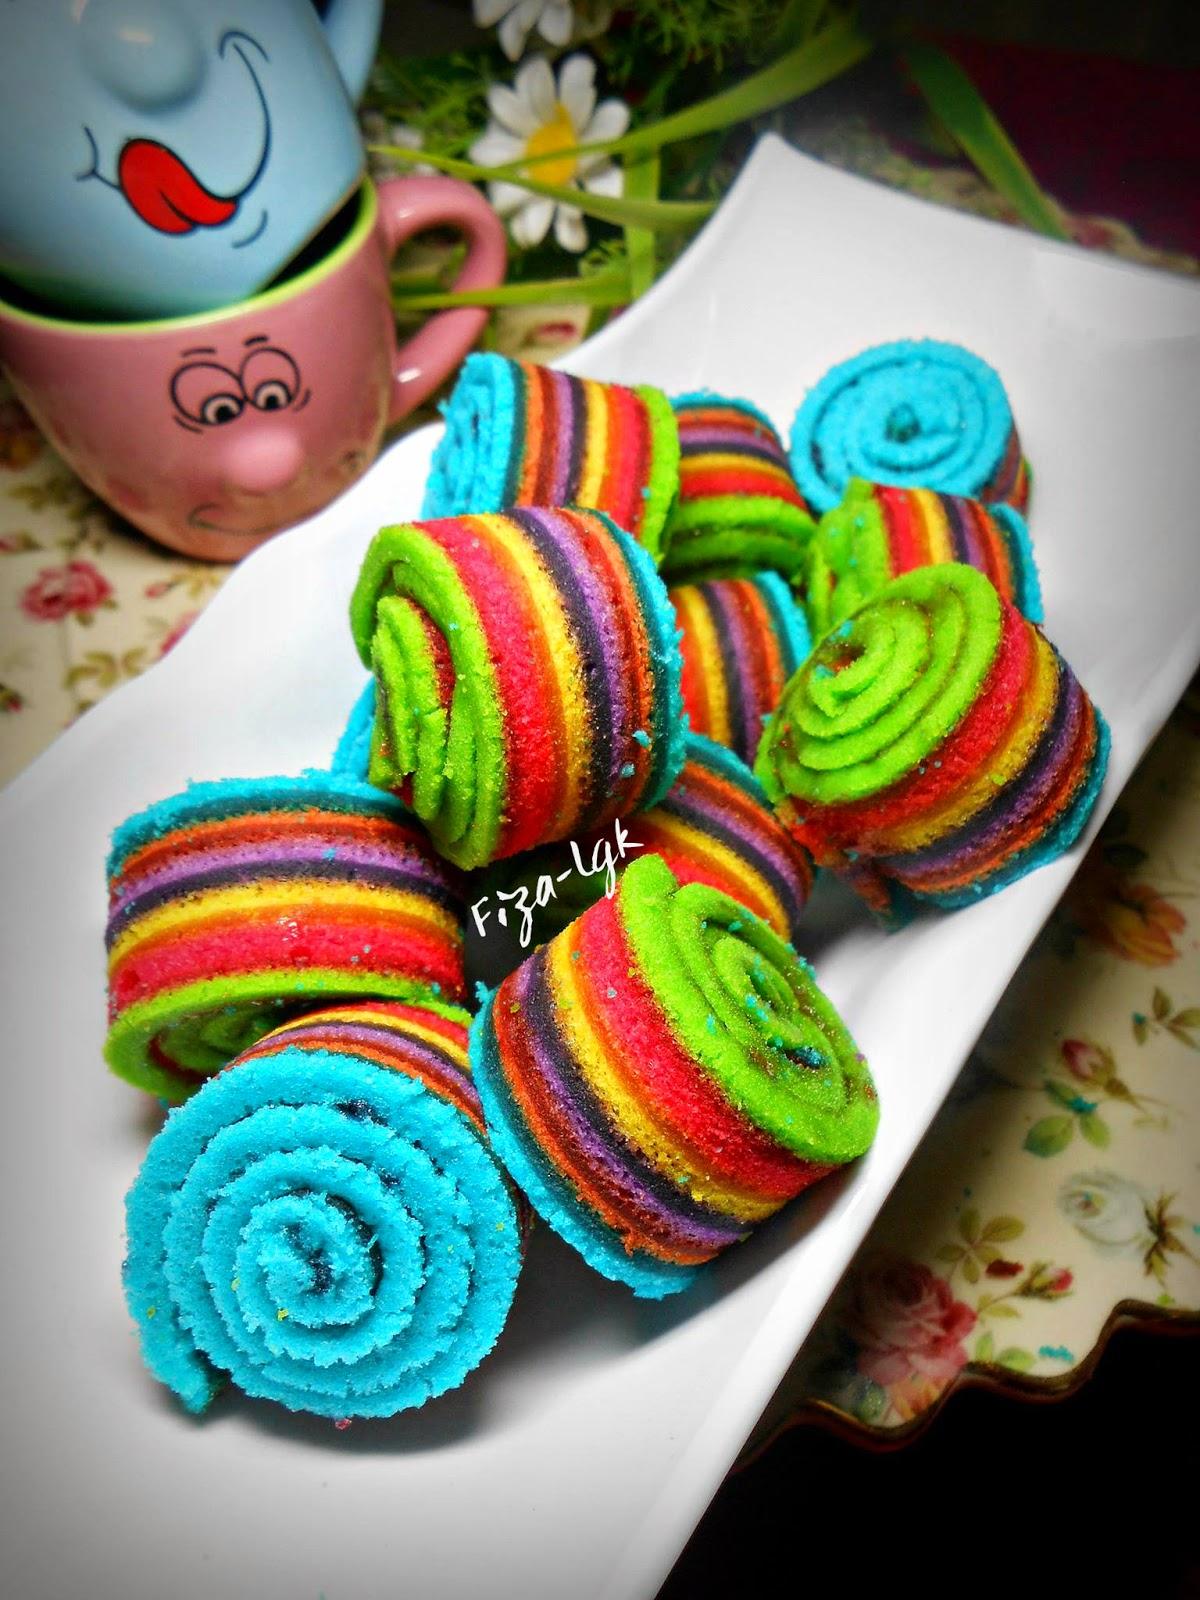 MINI RAINBOW CAKE ROLL - KUKUS | Fiza's Cooking